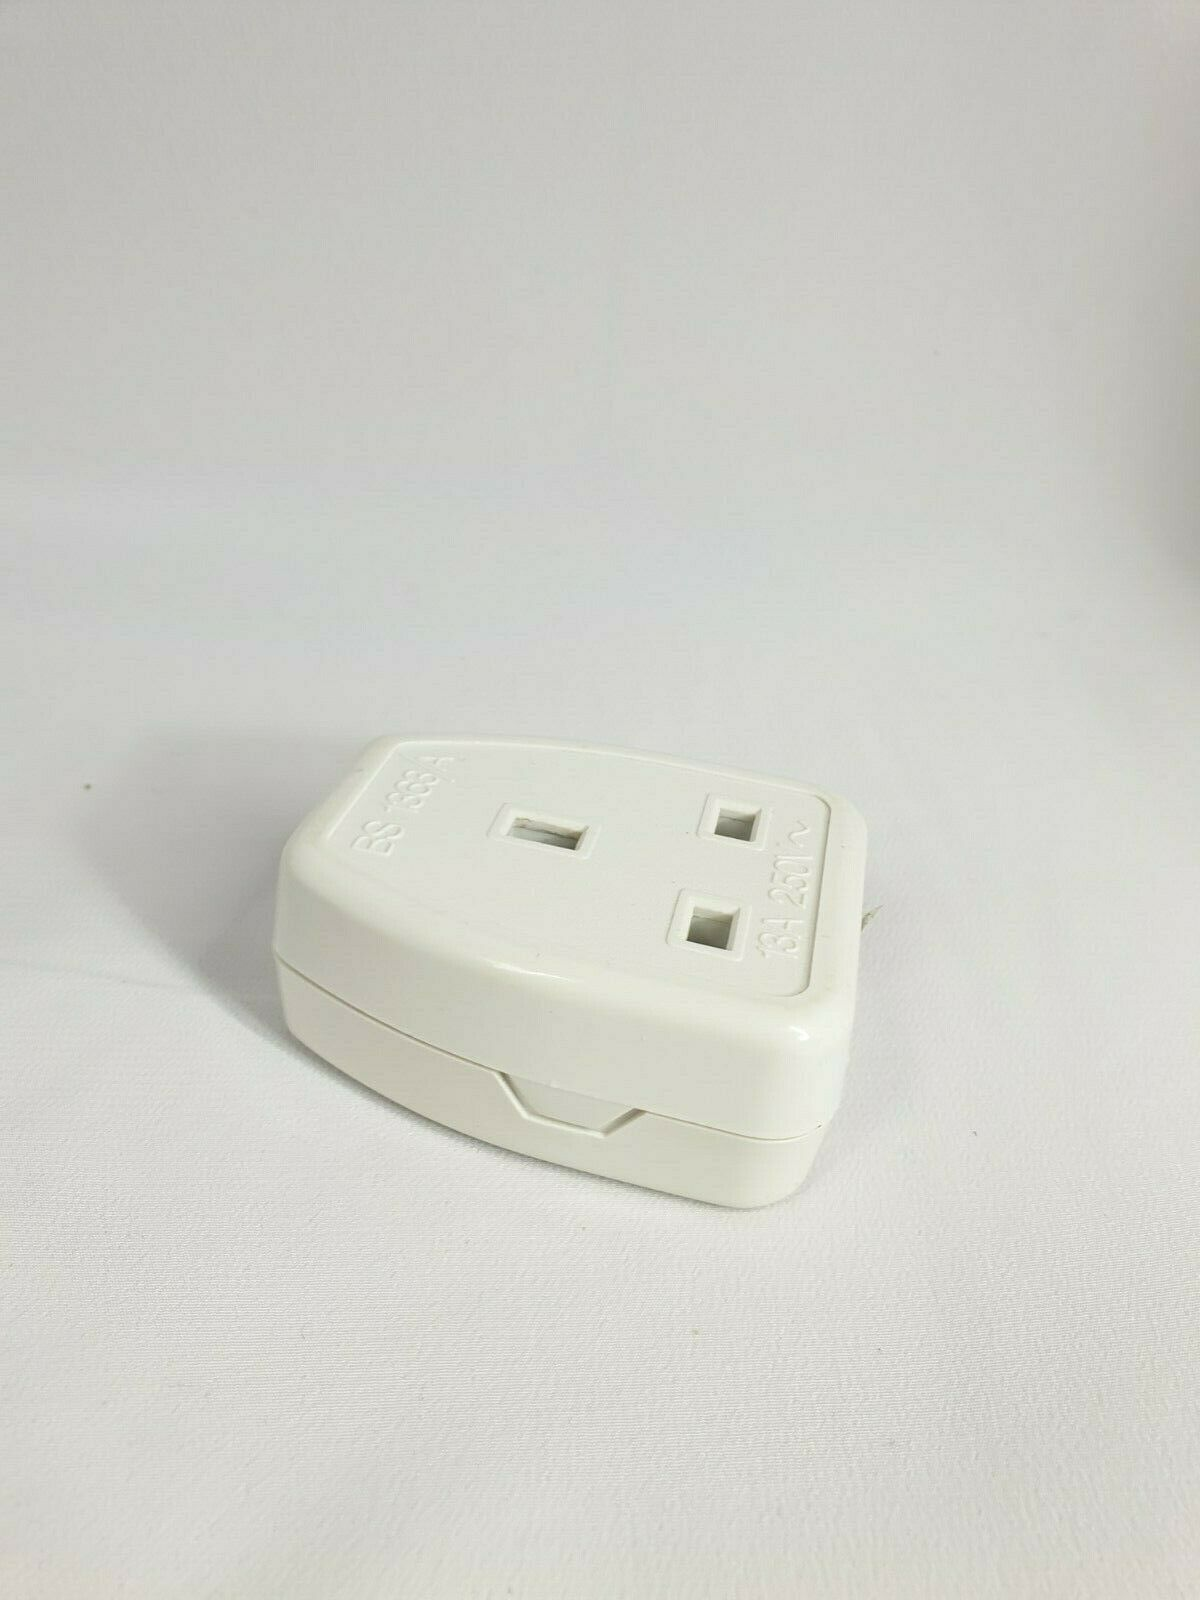 Extension Lead Socket End Single Gang Socket 13Amp 250V 2PCS 143618609321